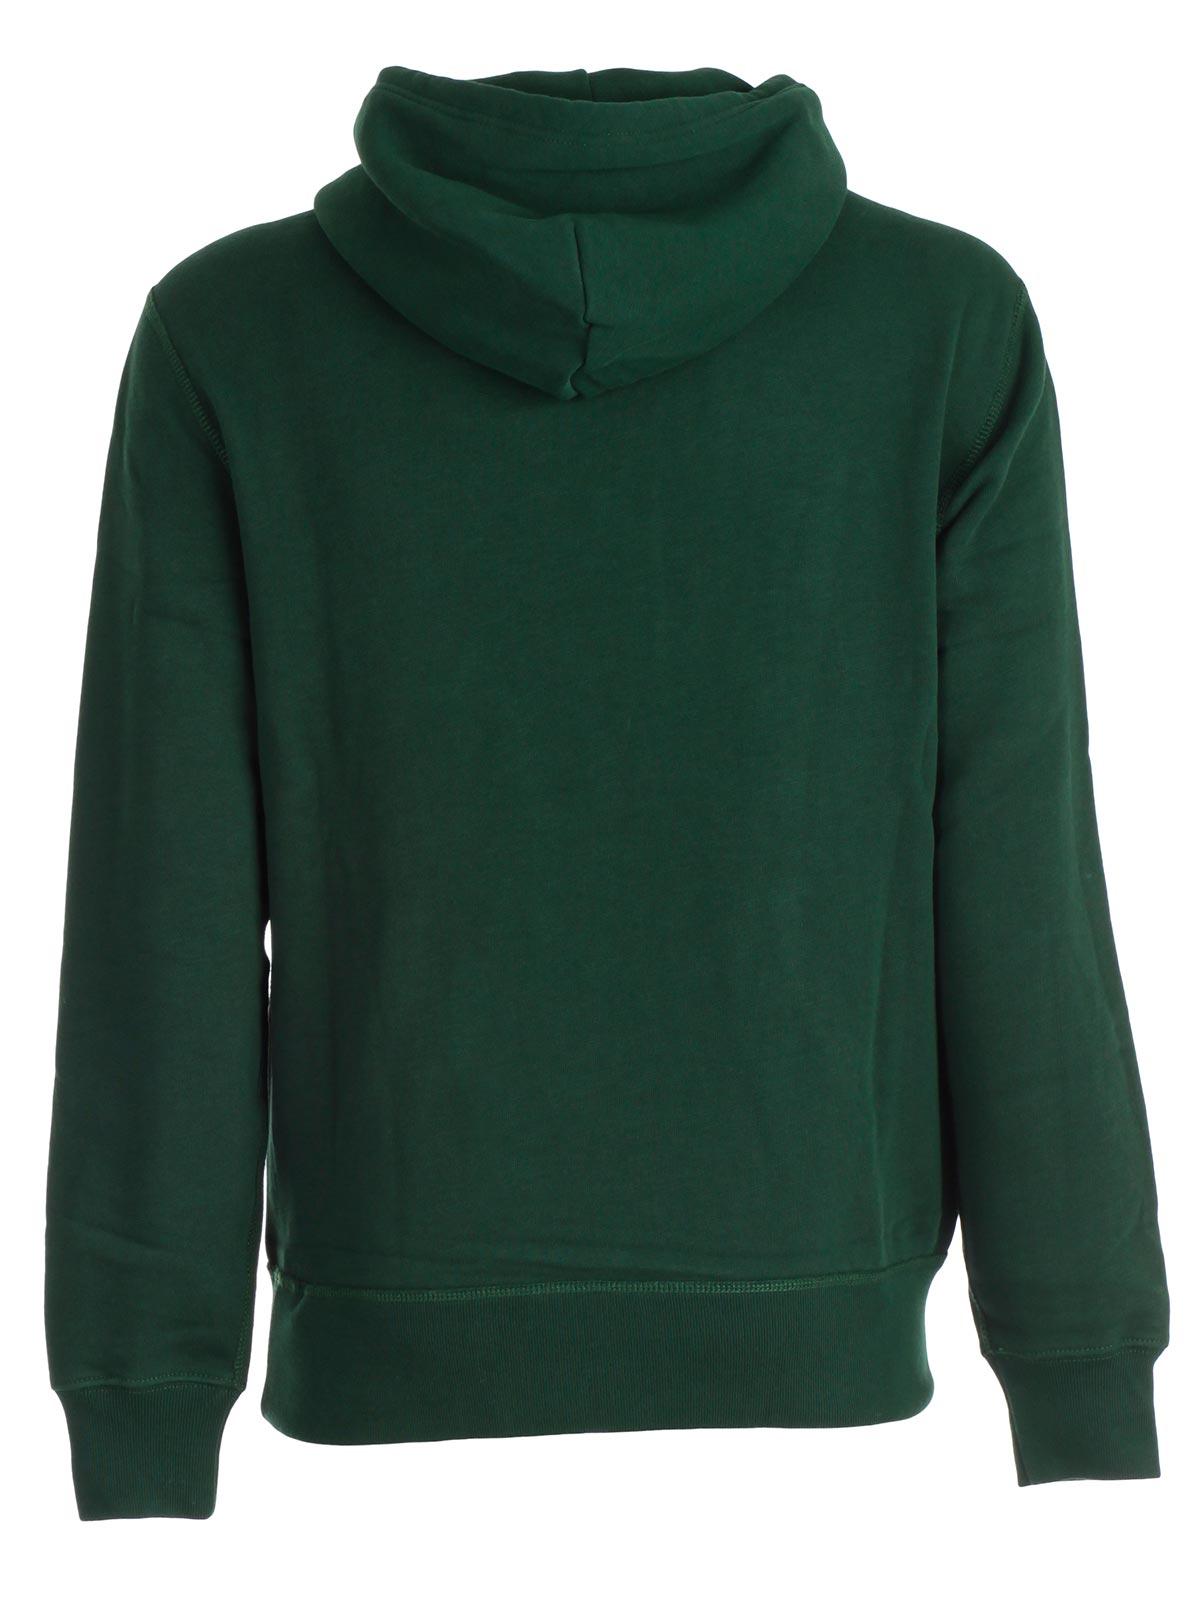 e603132cc490b Polo Ralph Lauren Sweatshirt 710.722644.002 - COLLEGE GREEN ...